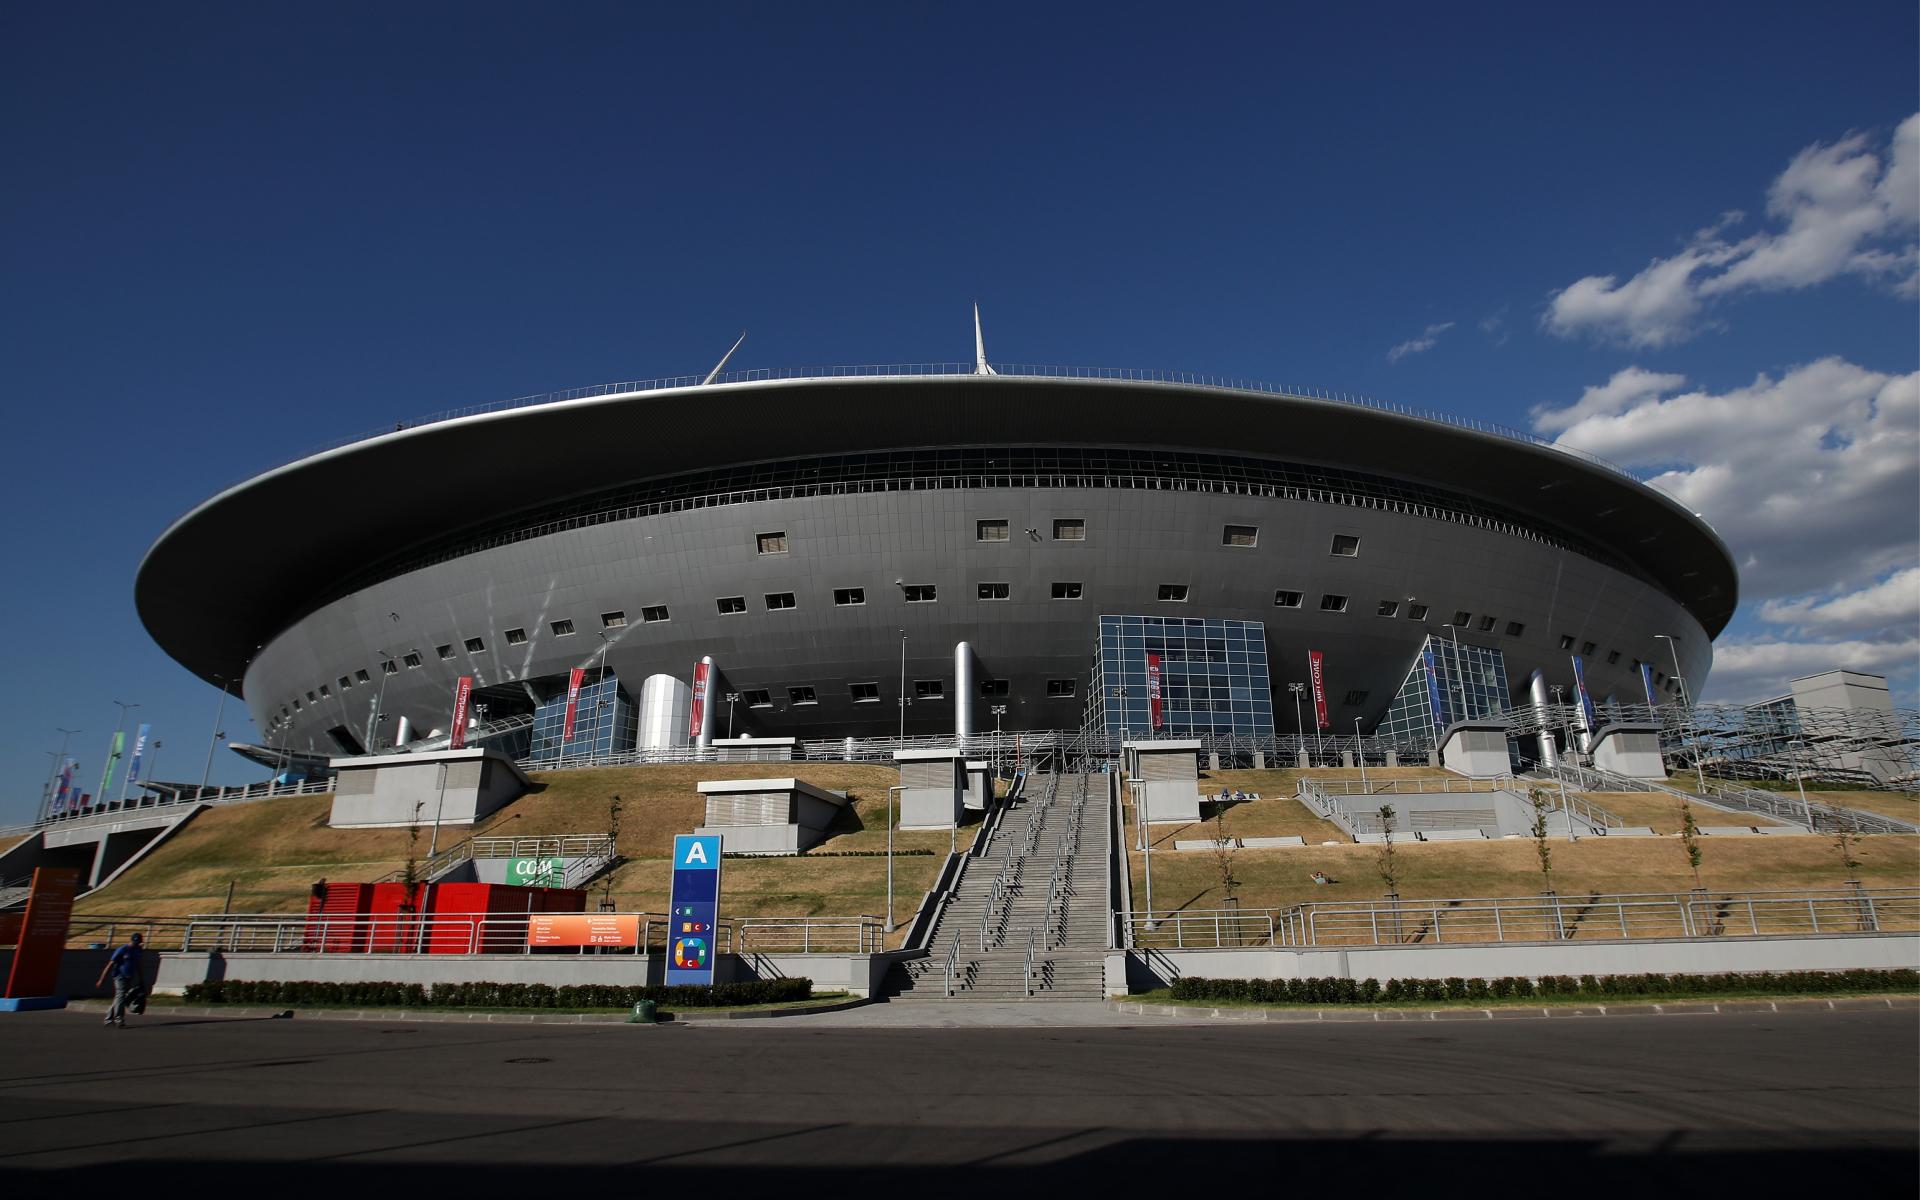 Фото: «Газпром Арена»  (Photo by Julian Finney/Getty Images)